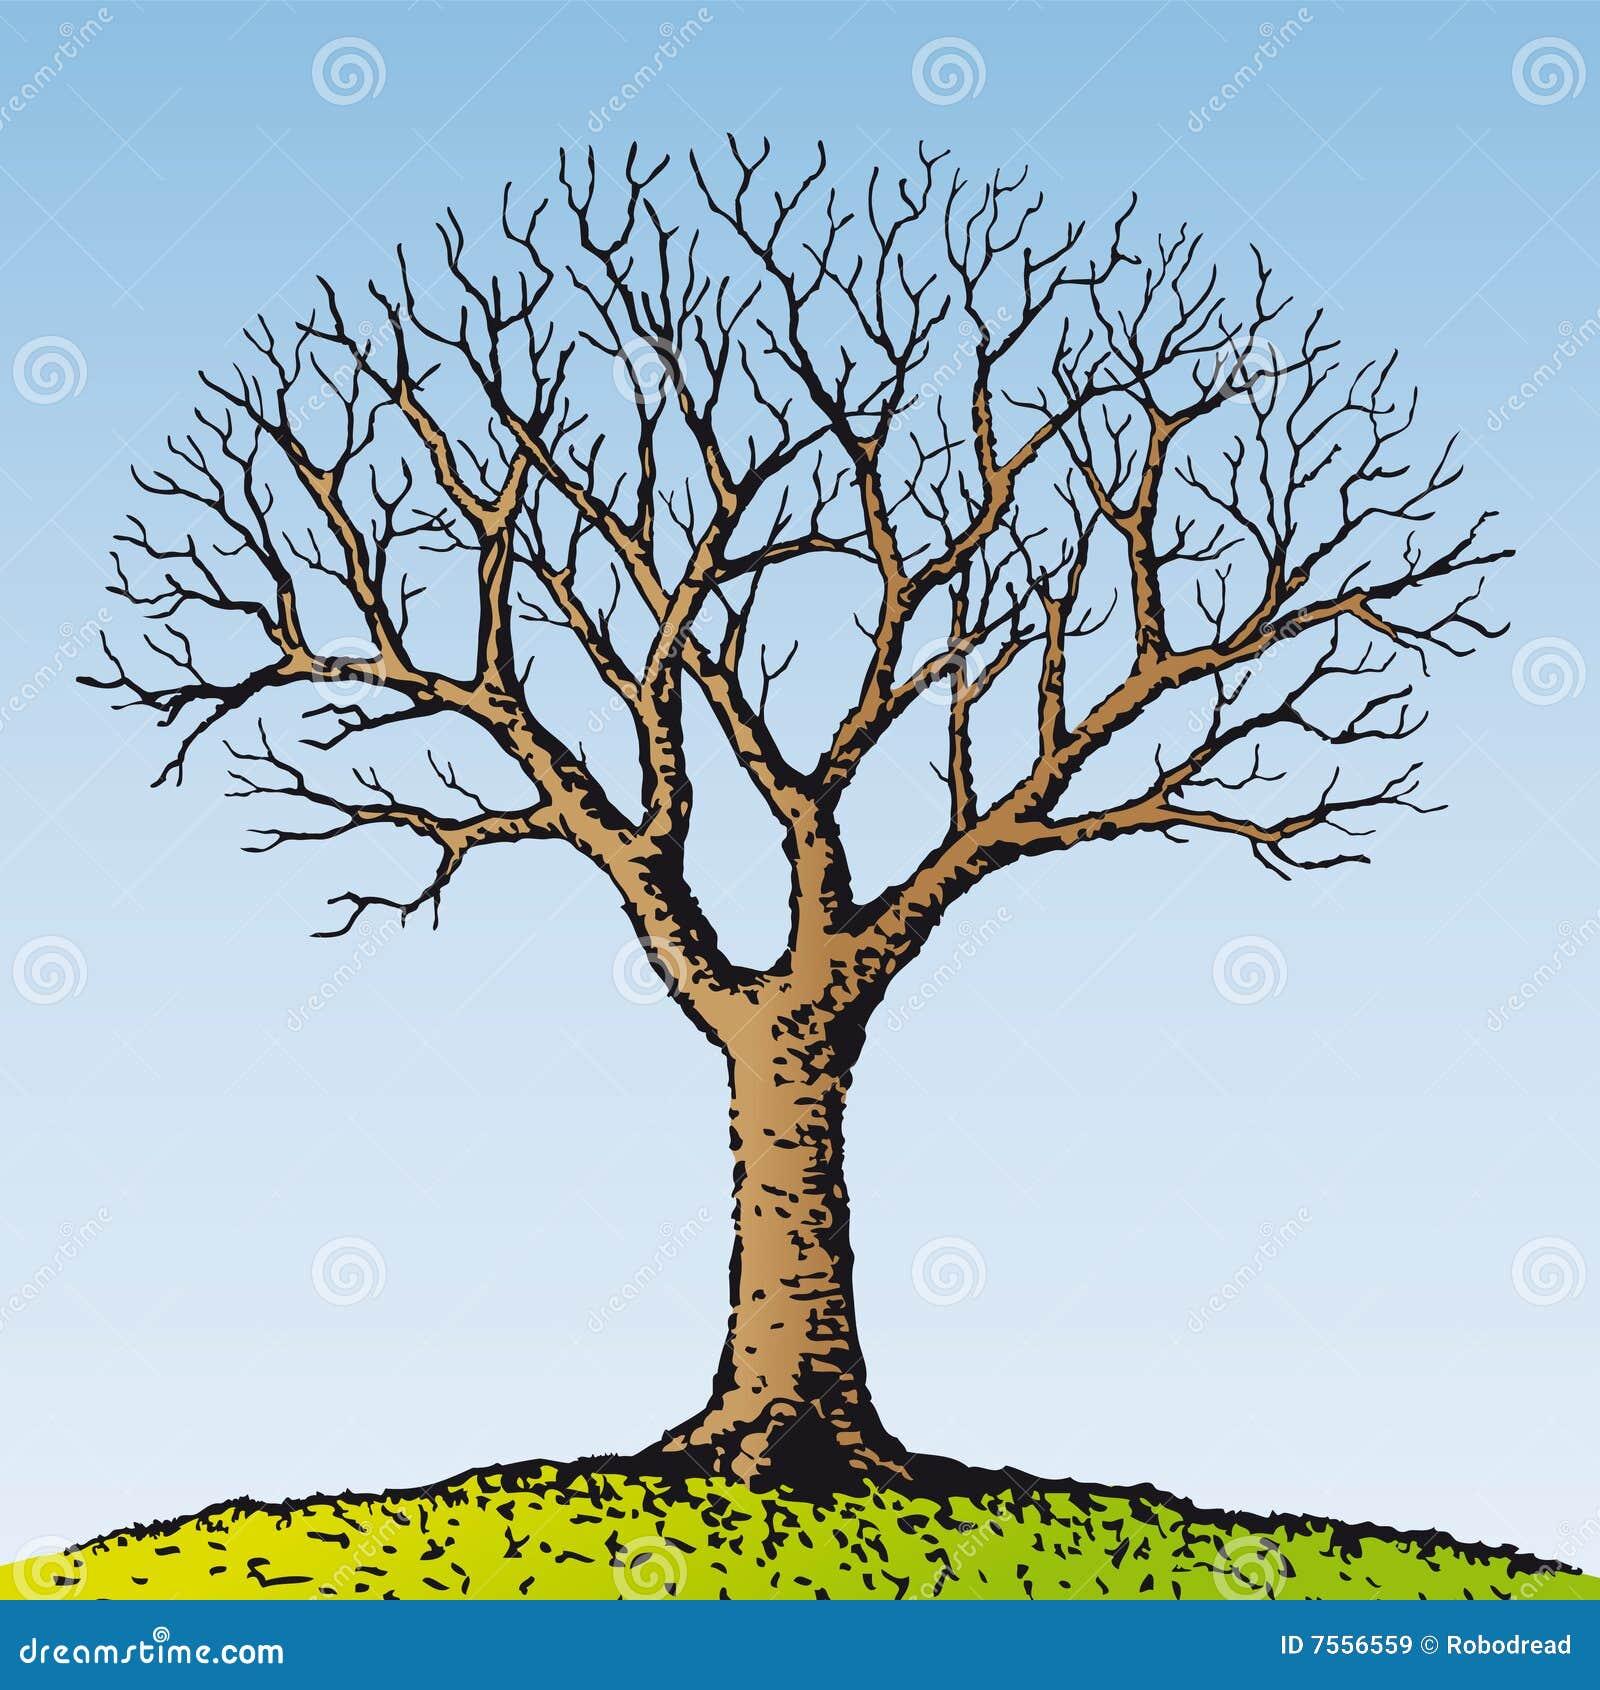 Vector Illustration Tree: Bare Tree (vector) Stock Vector. Illustration Of Forest